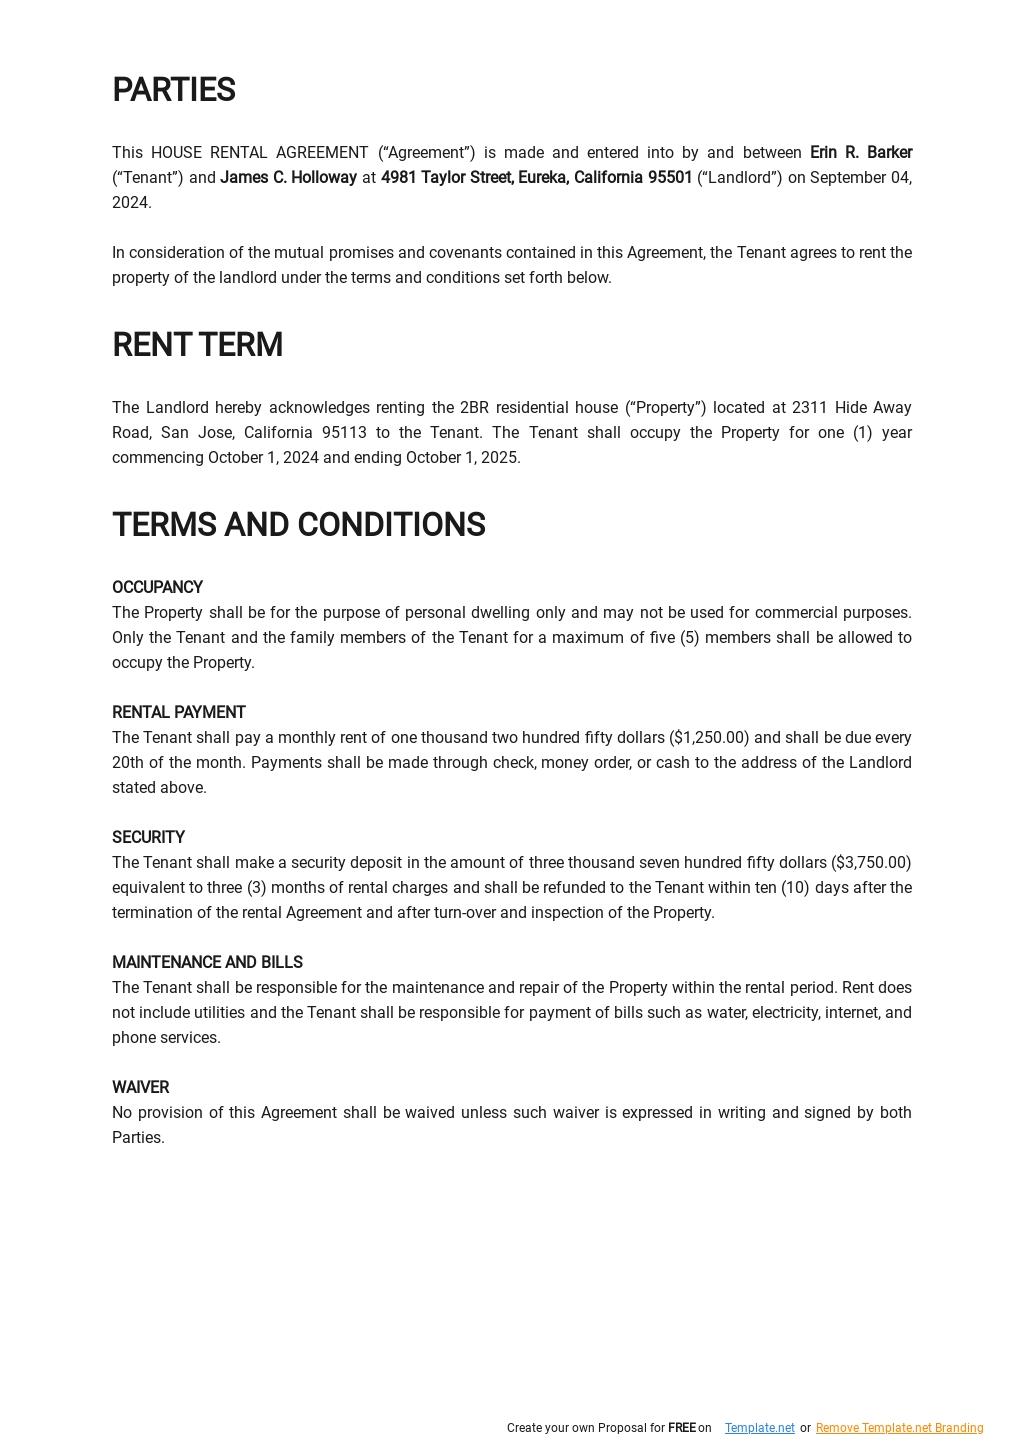 Simple House Rental Agreement Template 1.jpe